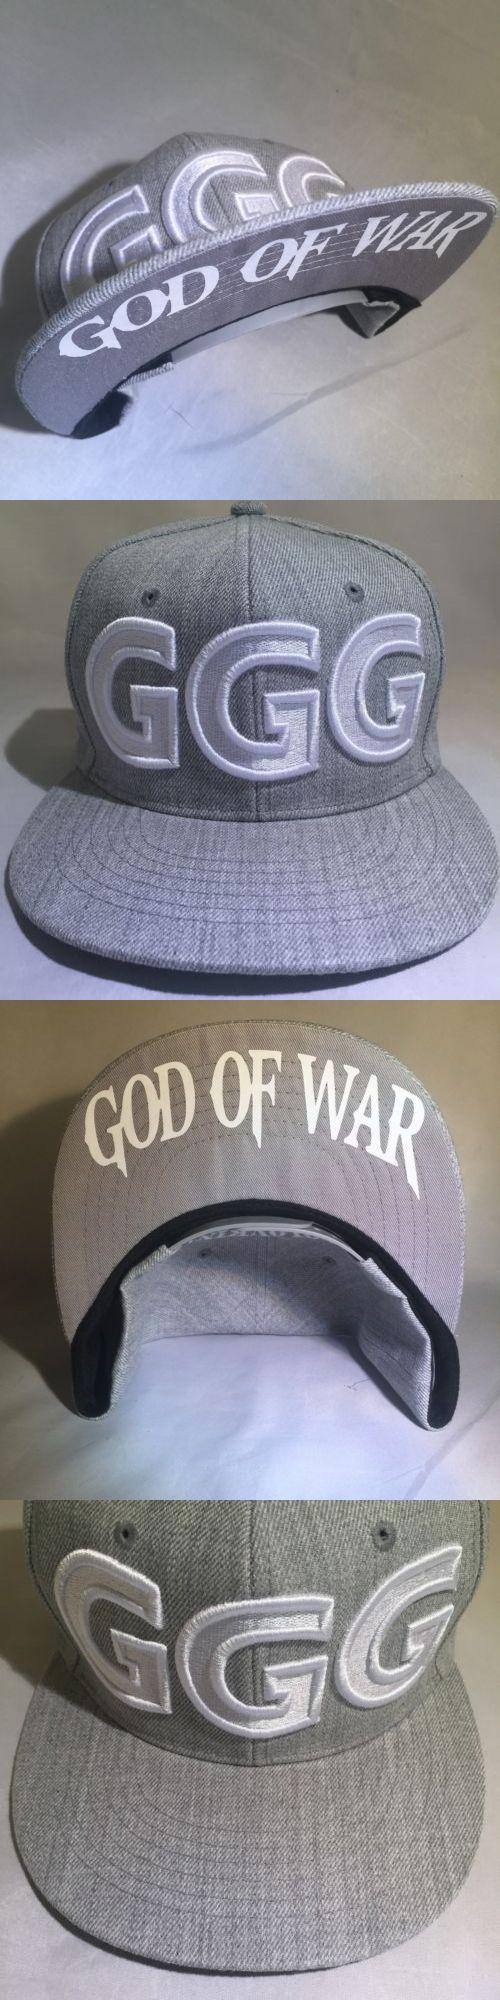 Headbands and Hats 179769: Ggg God Of War Canelo Alvarez Gennady Golovkin Boxing Hat Snapback Gray 1 -> BUY IT NOW ONLY: $31.99 on eBay!